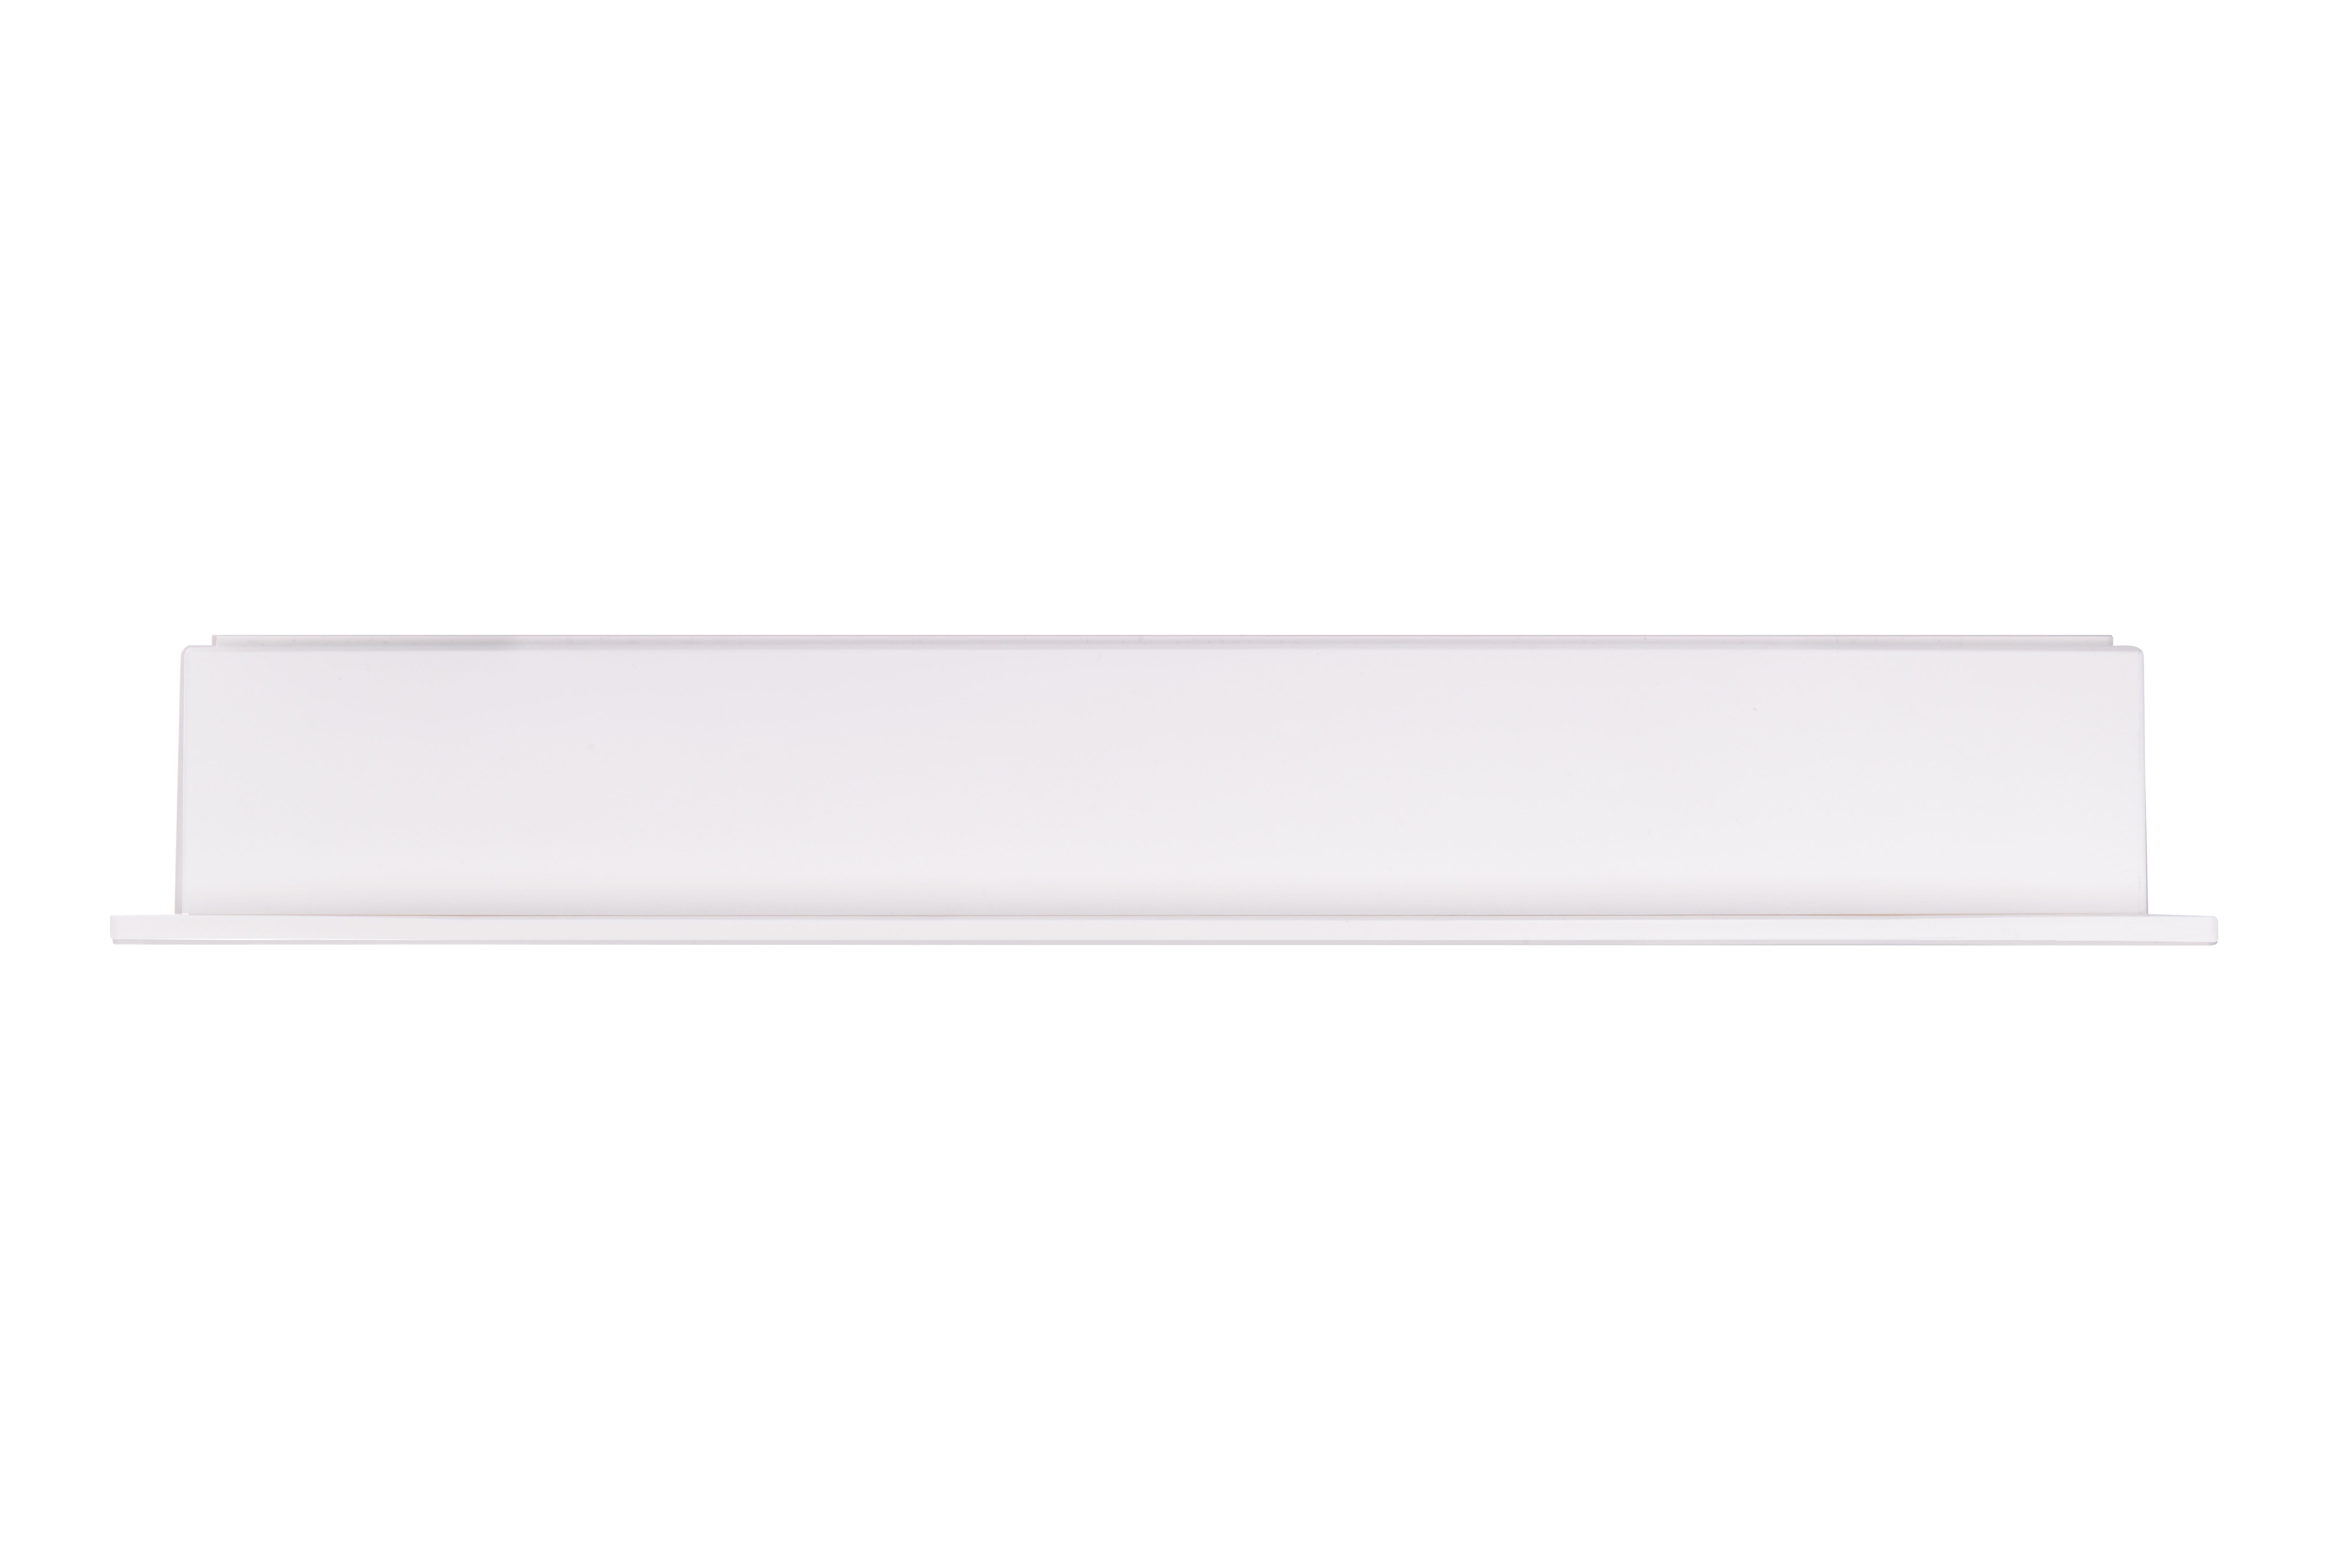 Lampa antipanica led Intelight 94714   3h mentinut test automat 5